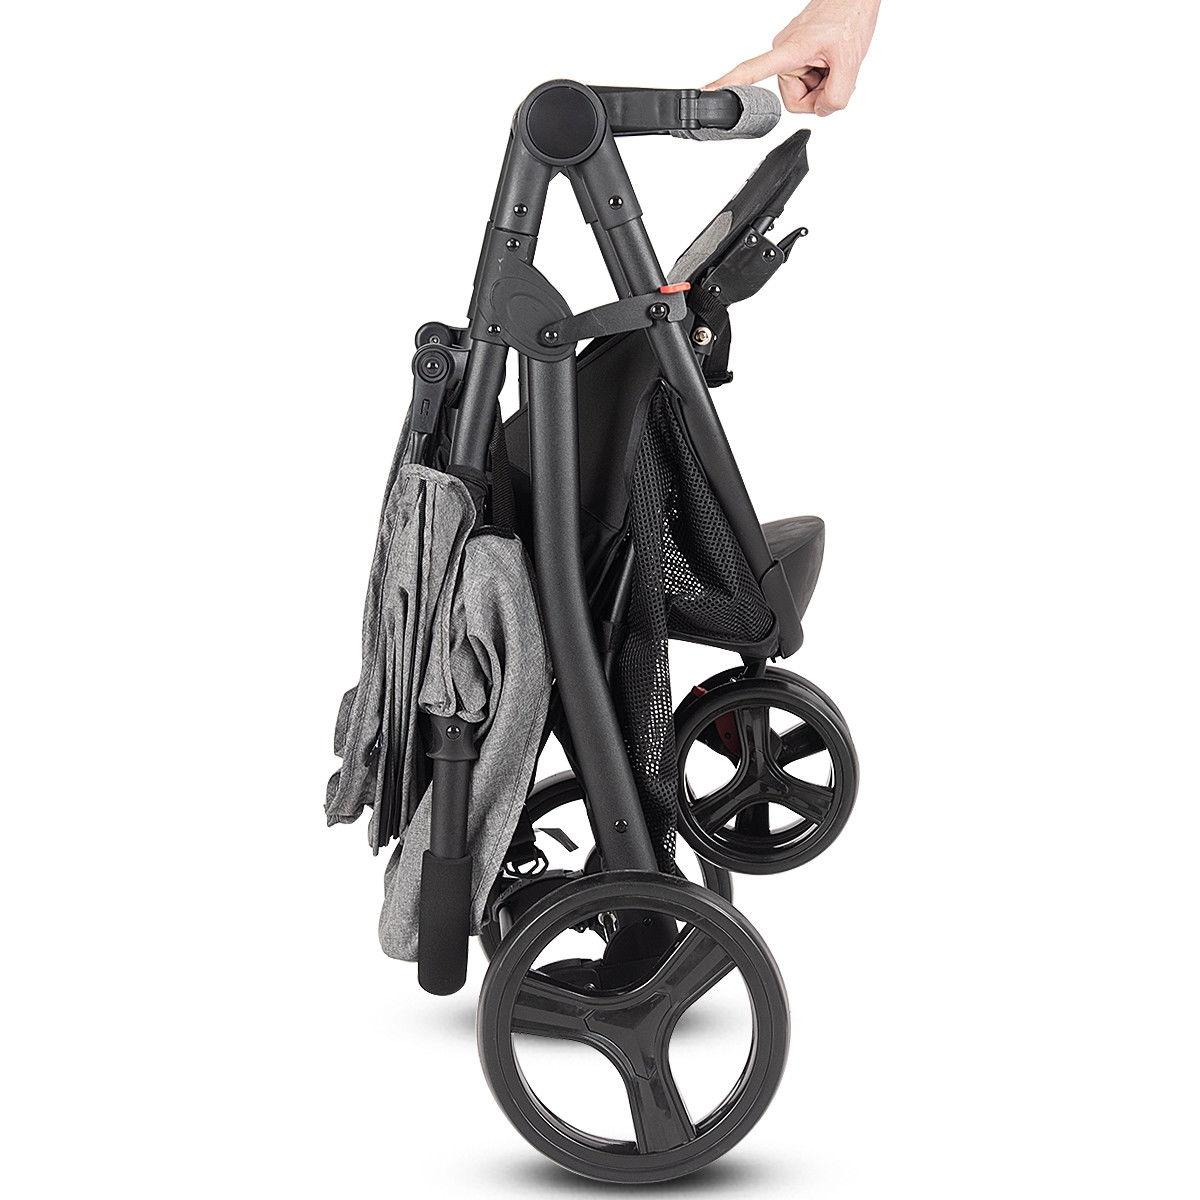 Portable Folding Baby Stroller Kids Travel Pushchair-Gray